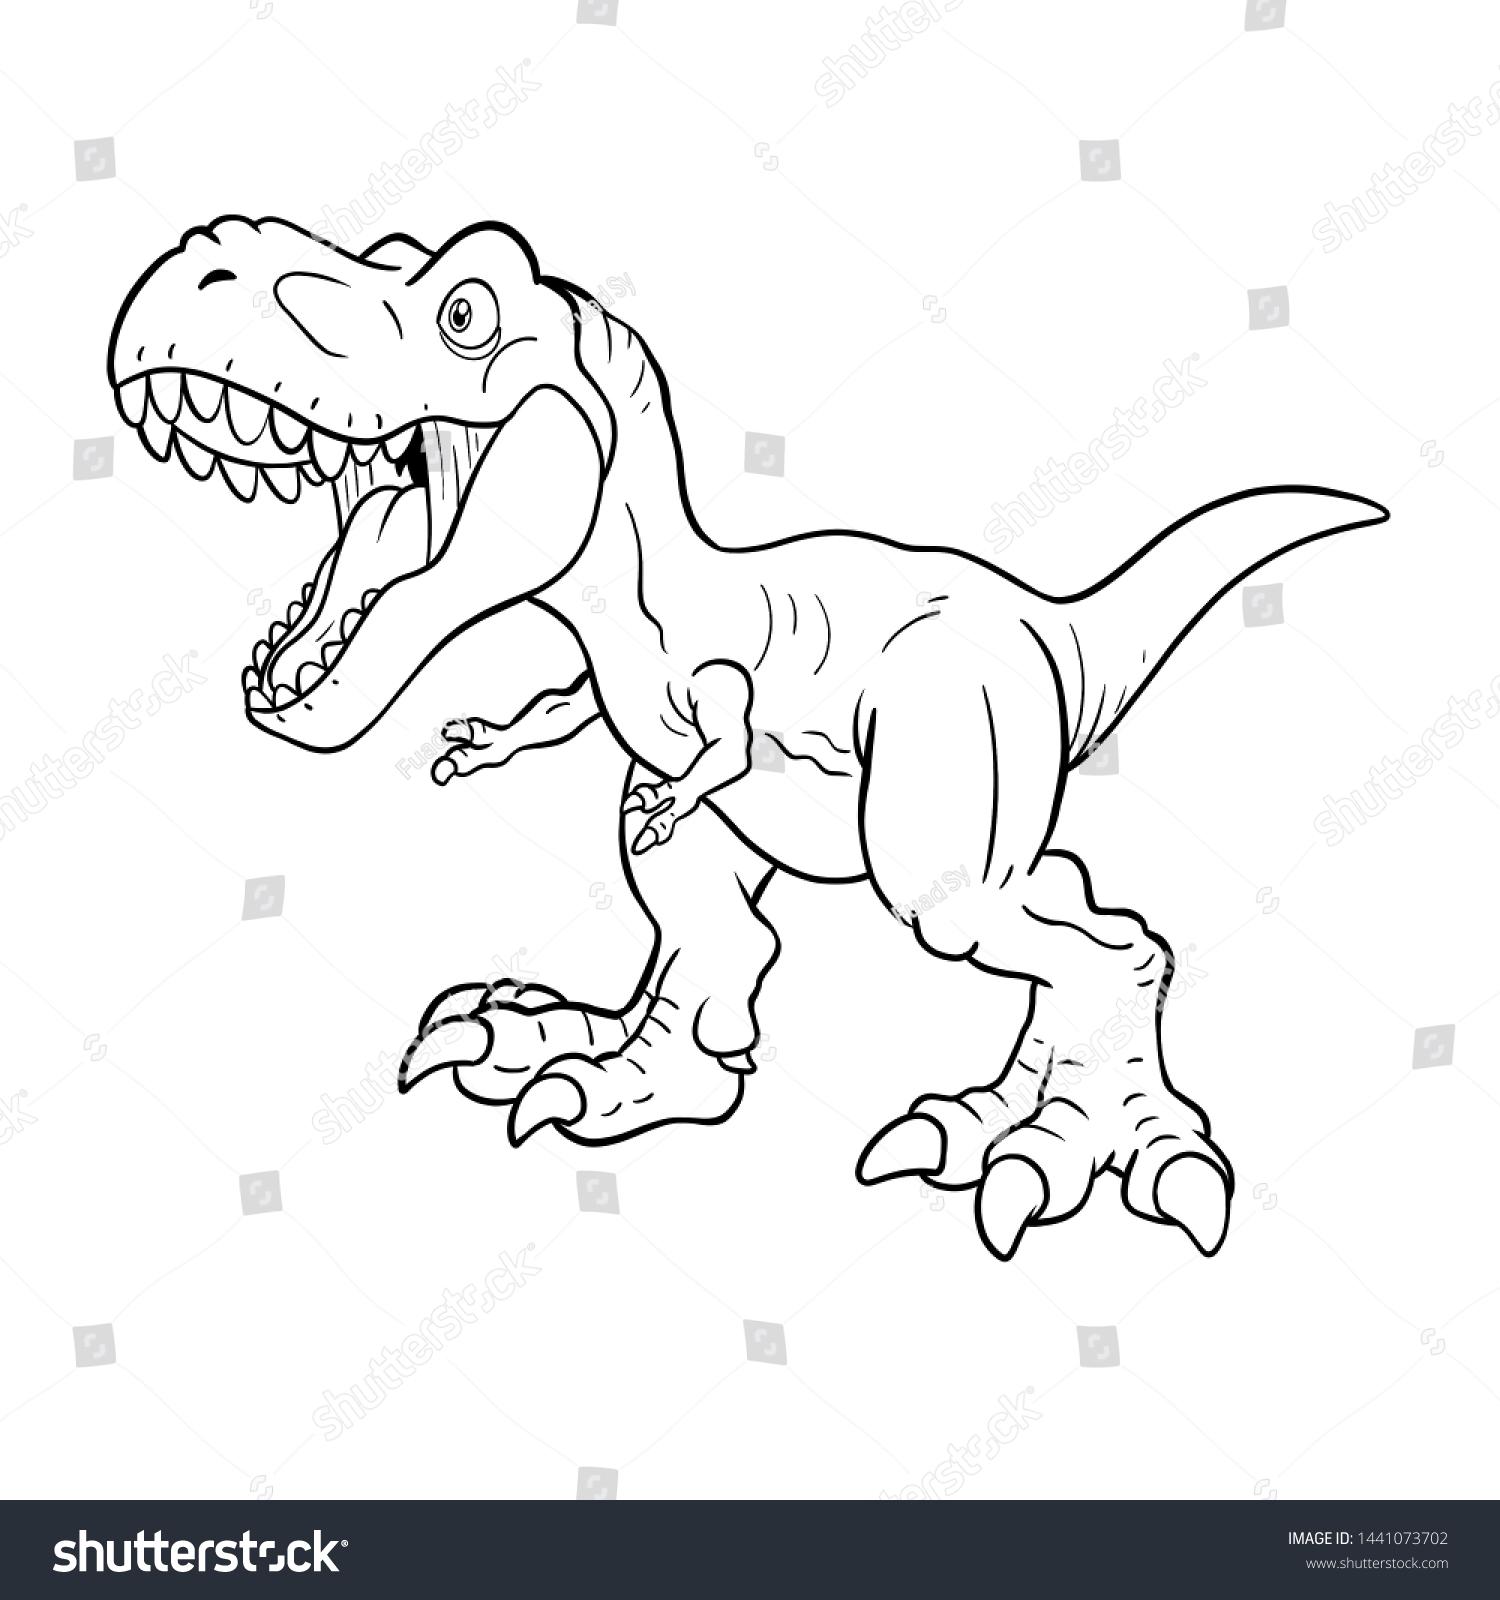 Cute Tyrannosaurus Rex Coloring Page Black Stock Illustration 1441073702